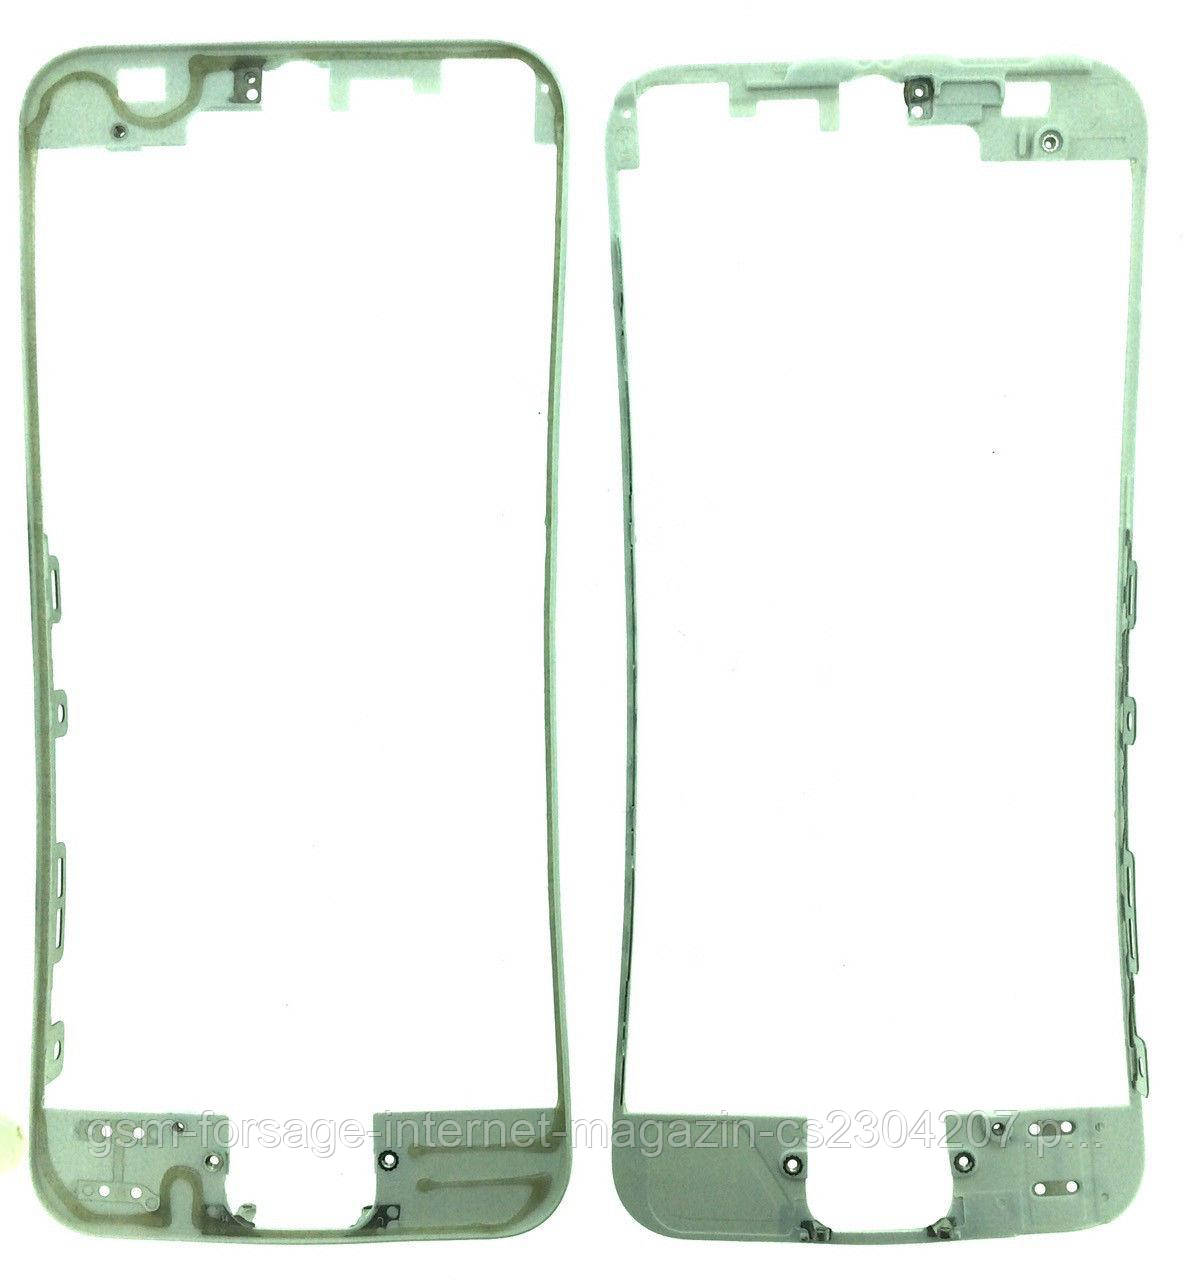 Рамка дисплея для iPhone 5 White